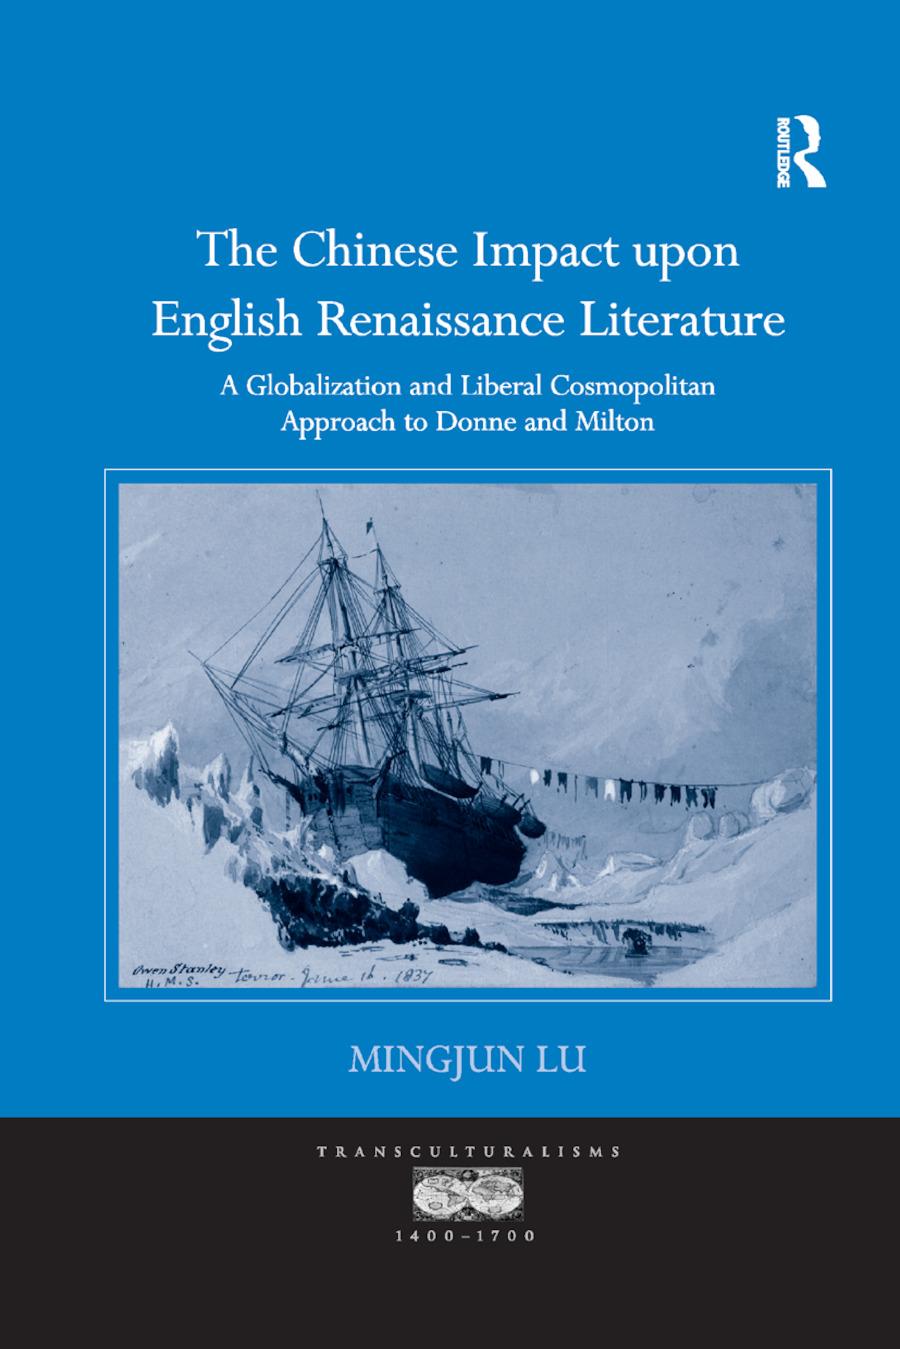 The Chinese Impact upon English Renaissance Literature